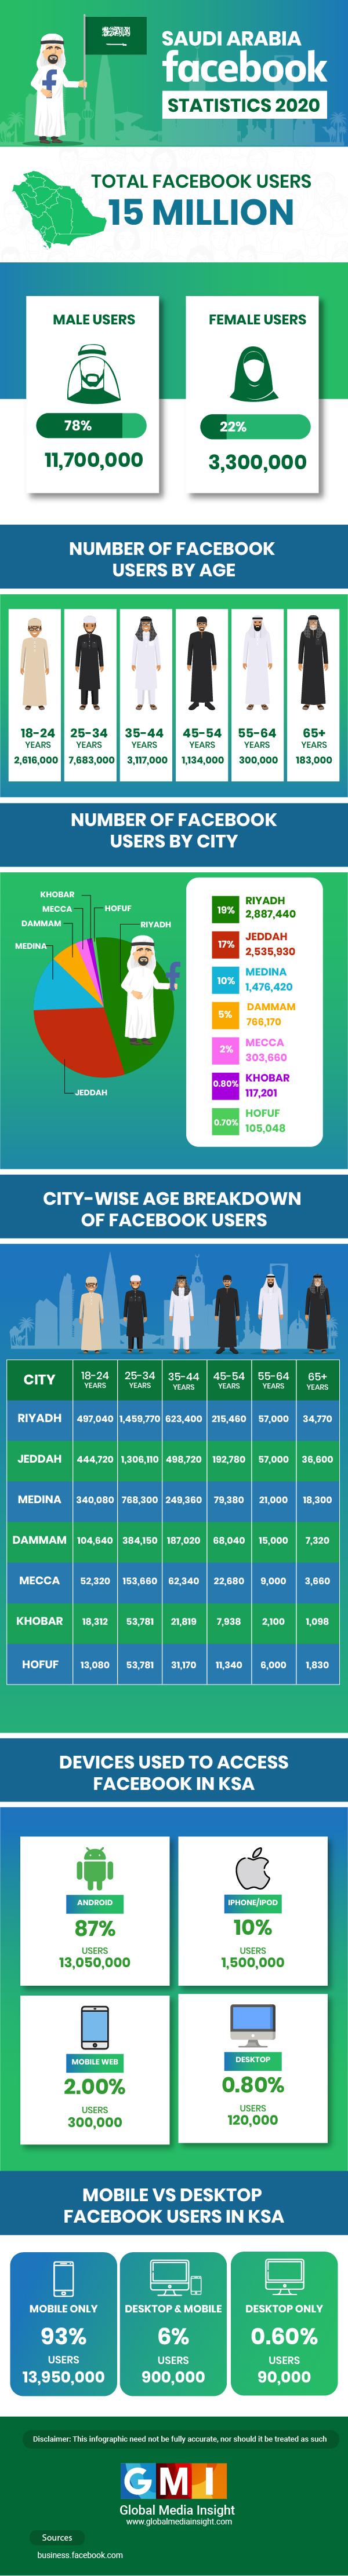 Saudi Arabia Facebook User Statistics 2020 # Infographic